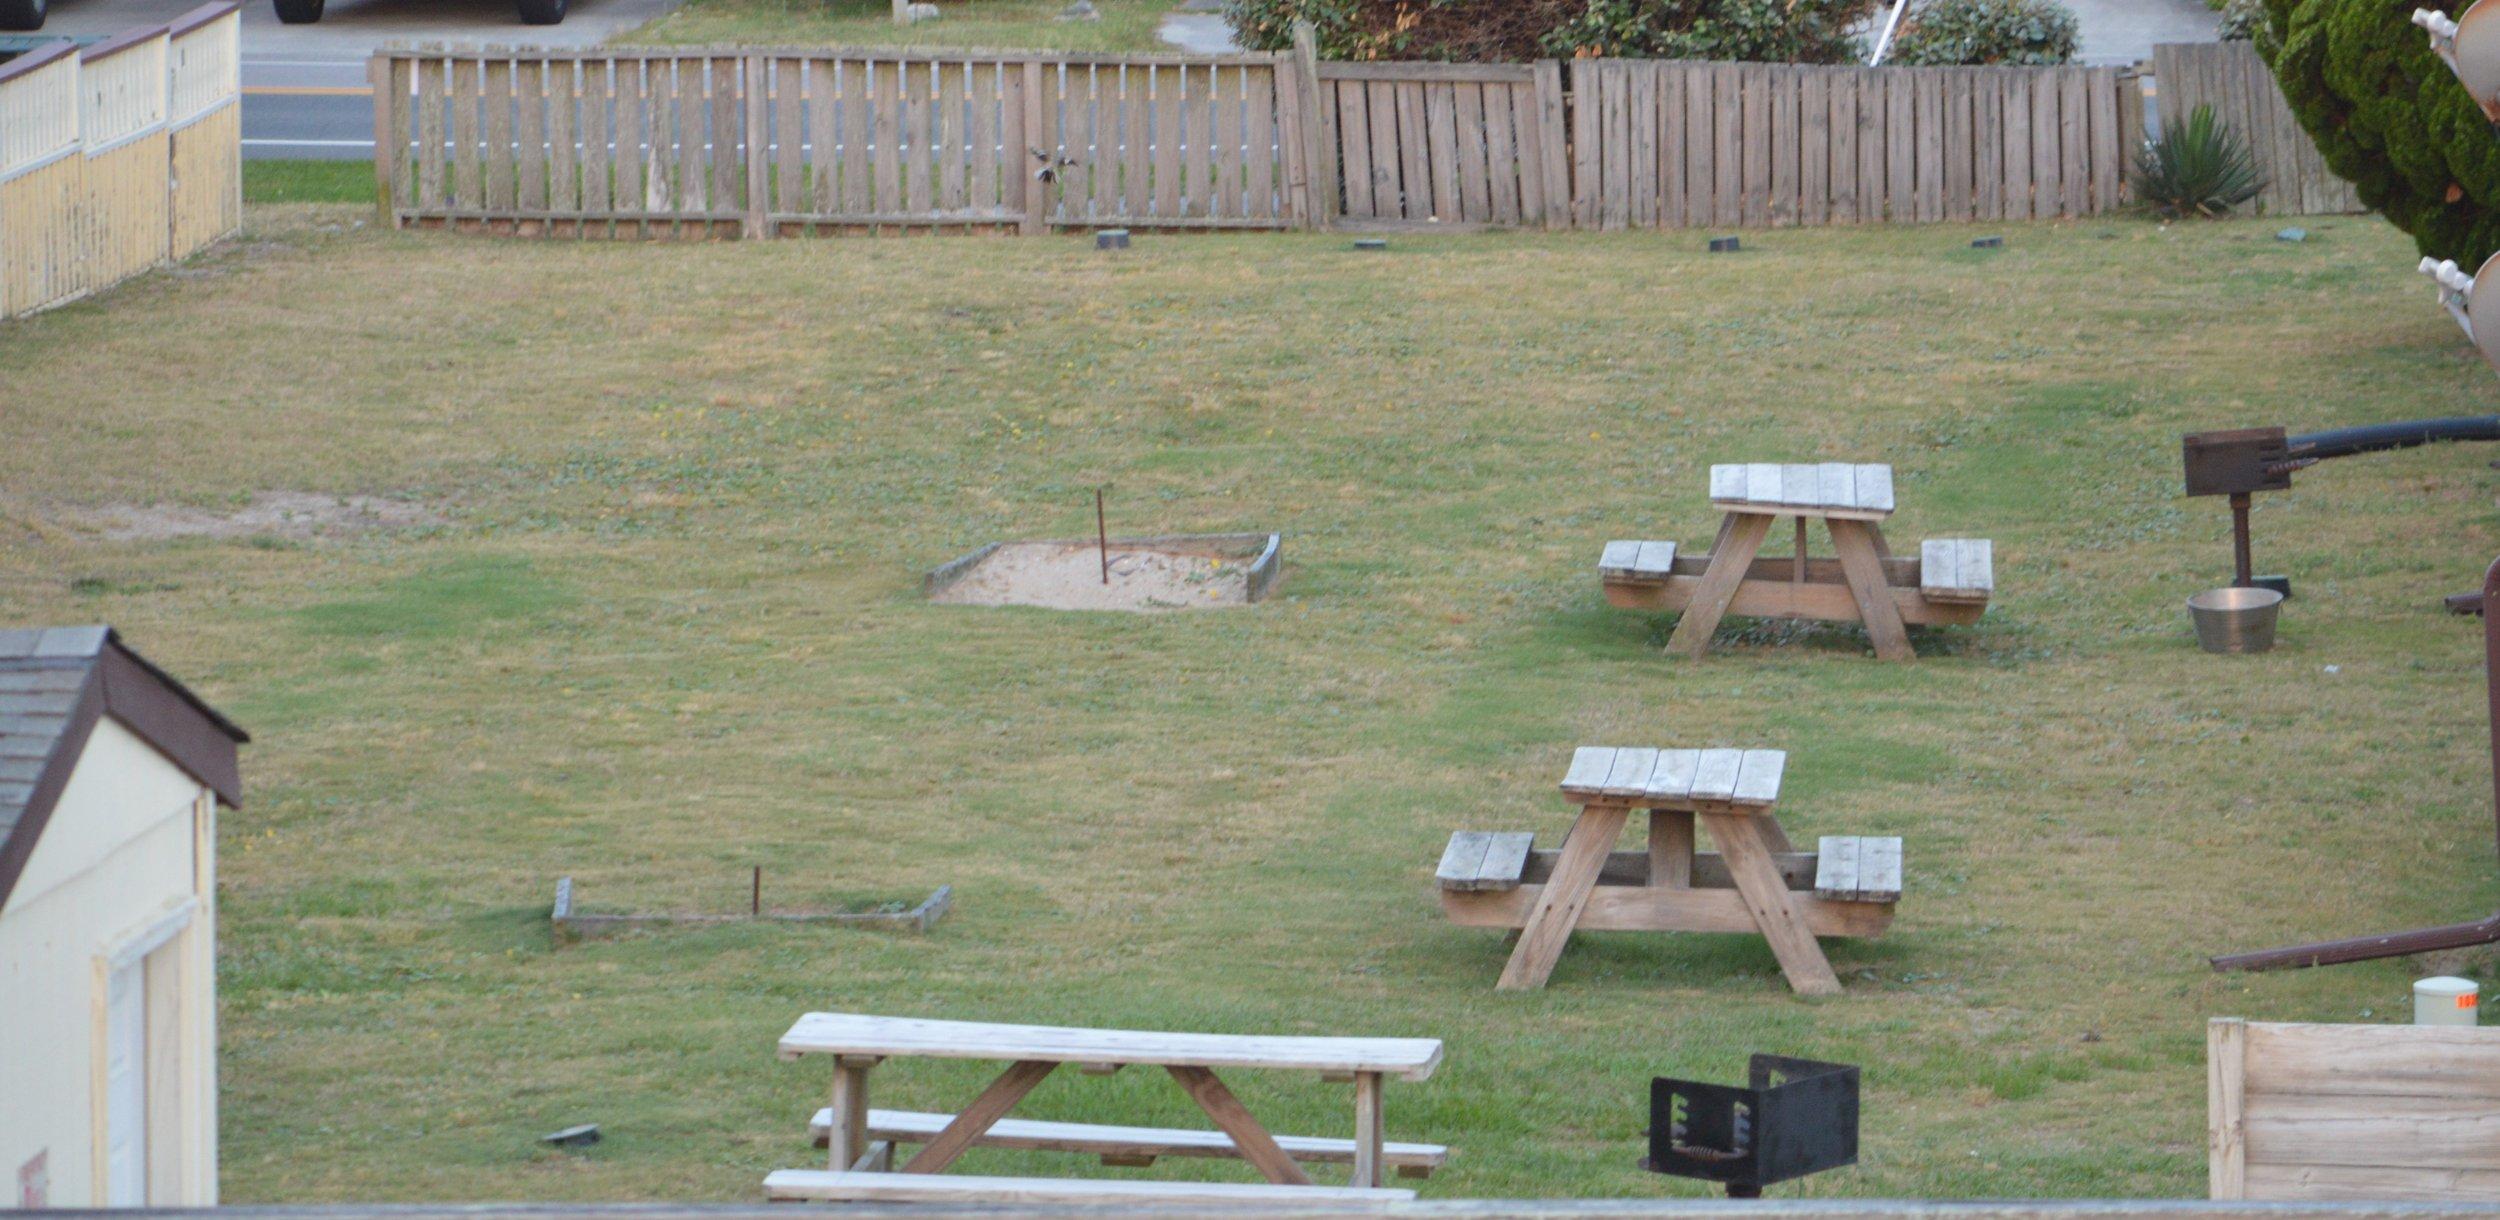 Picnic tables, grill and horseshoes adjacent Villa's 7 & 9